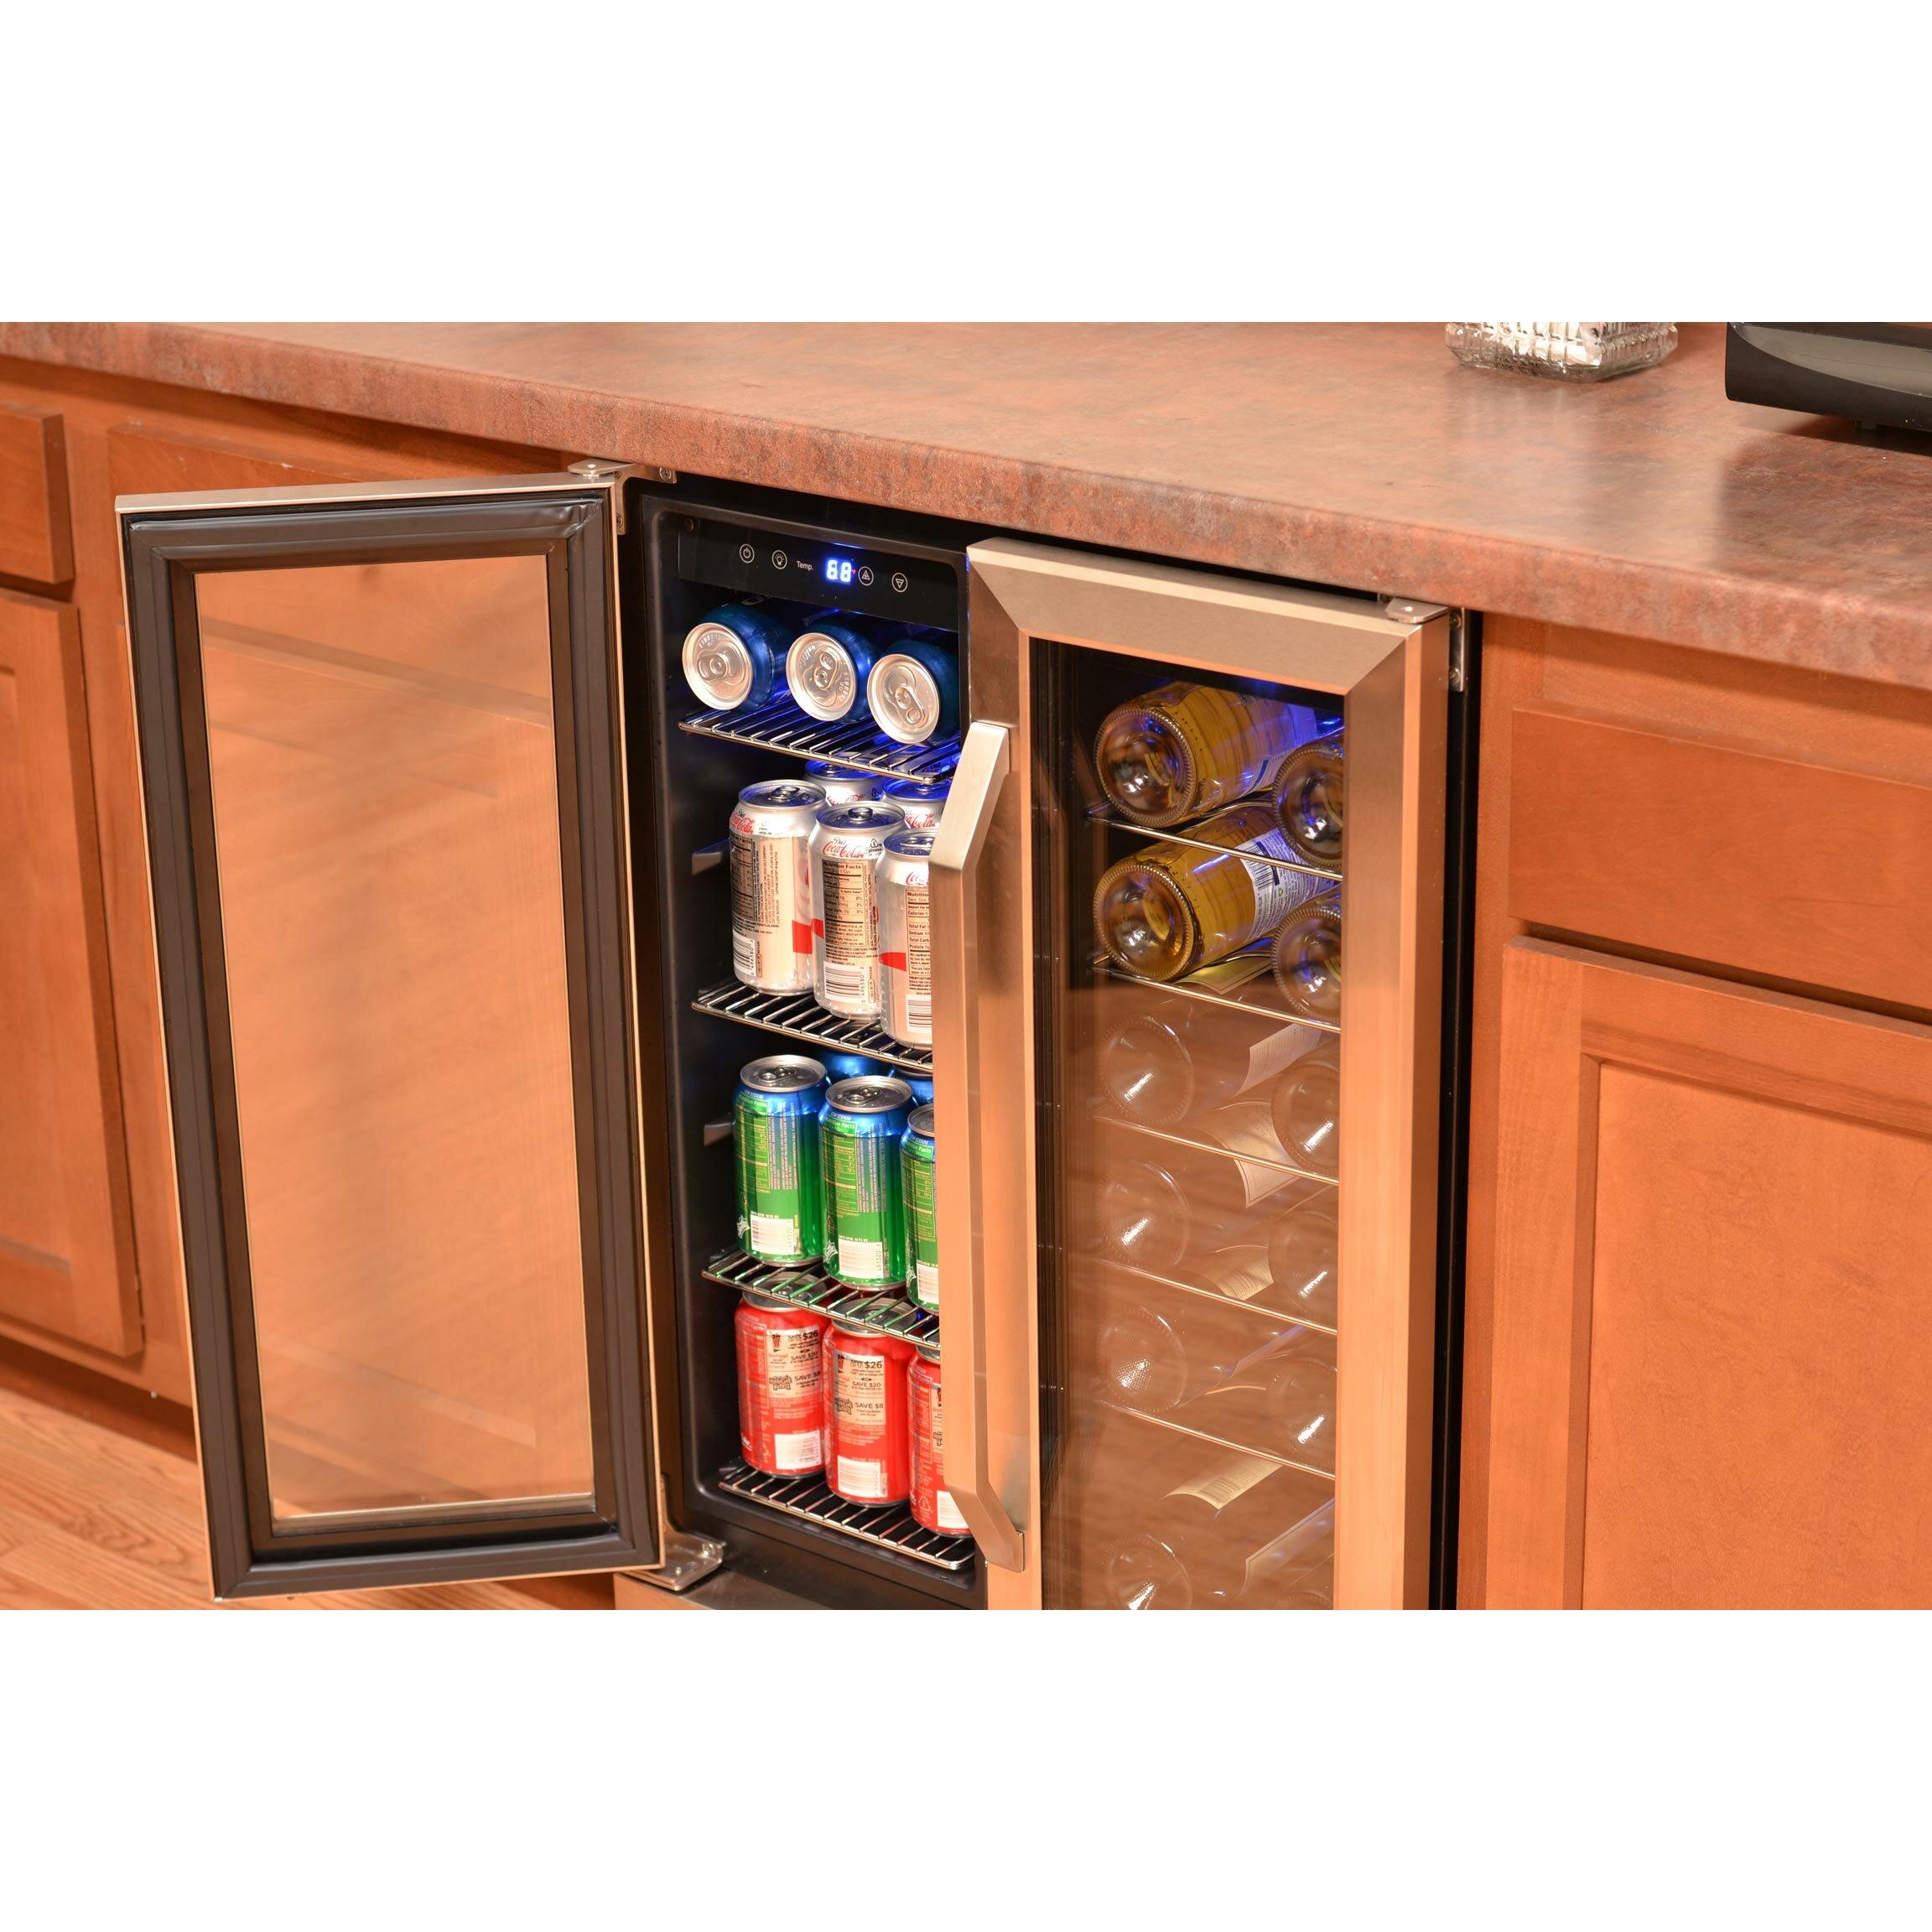 newair 18 bottle dual zone built in wine refrigerator reviews wayfair. Black Bedroom Furniture Sets. Home Design Ideas